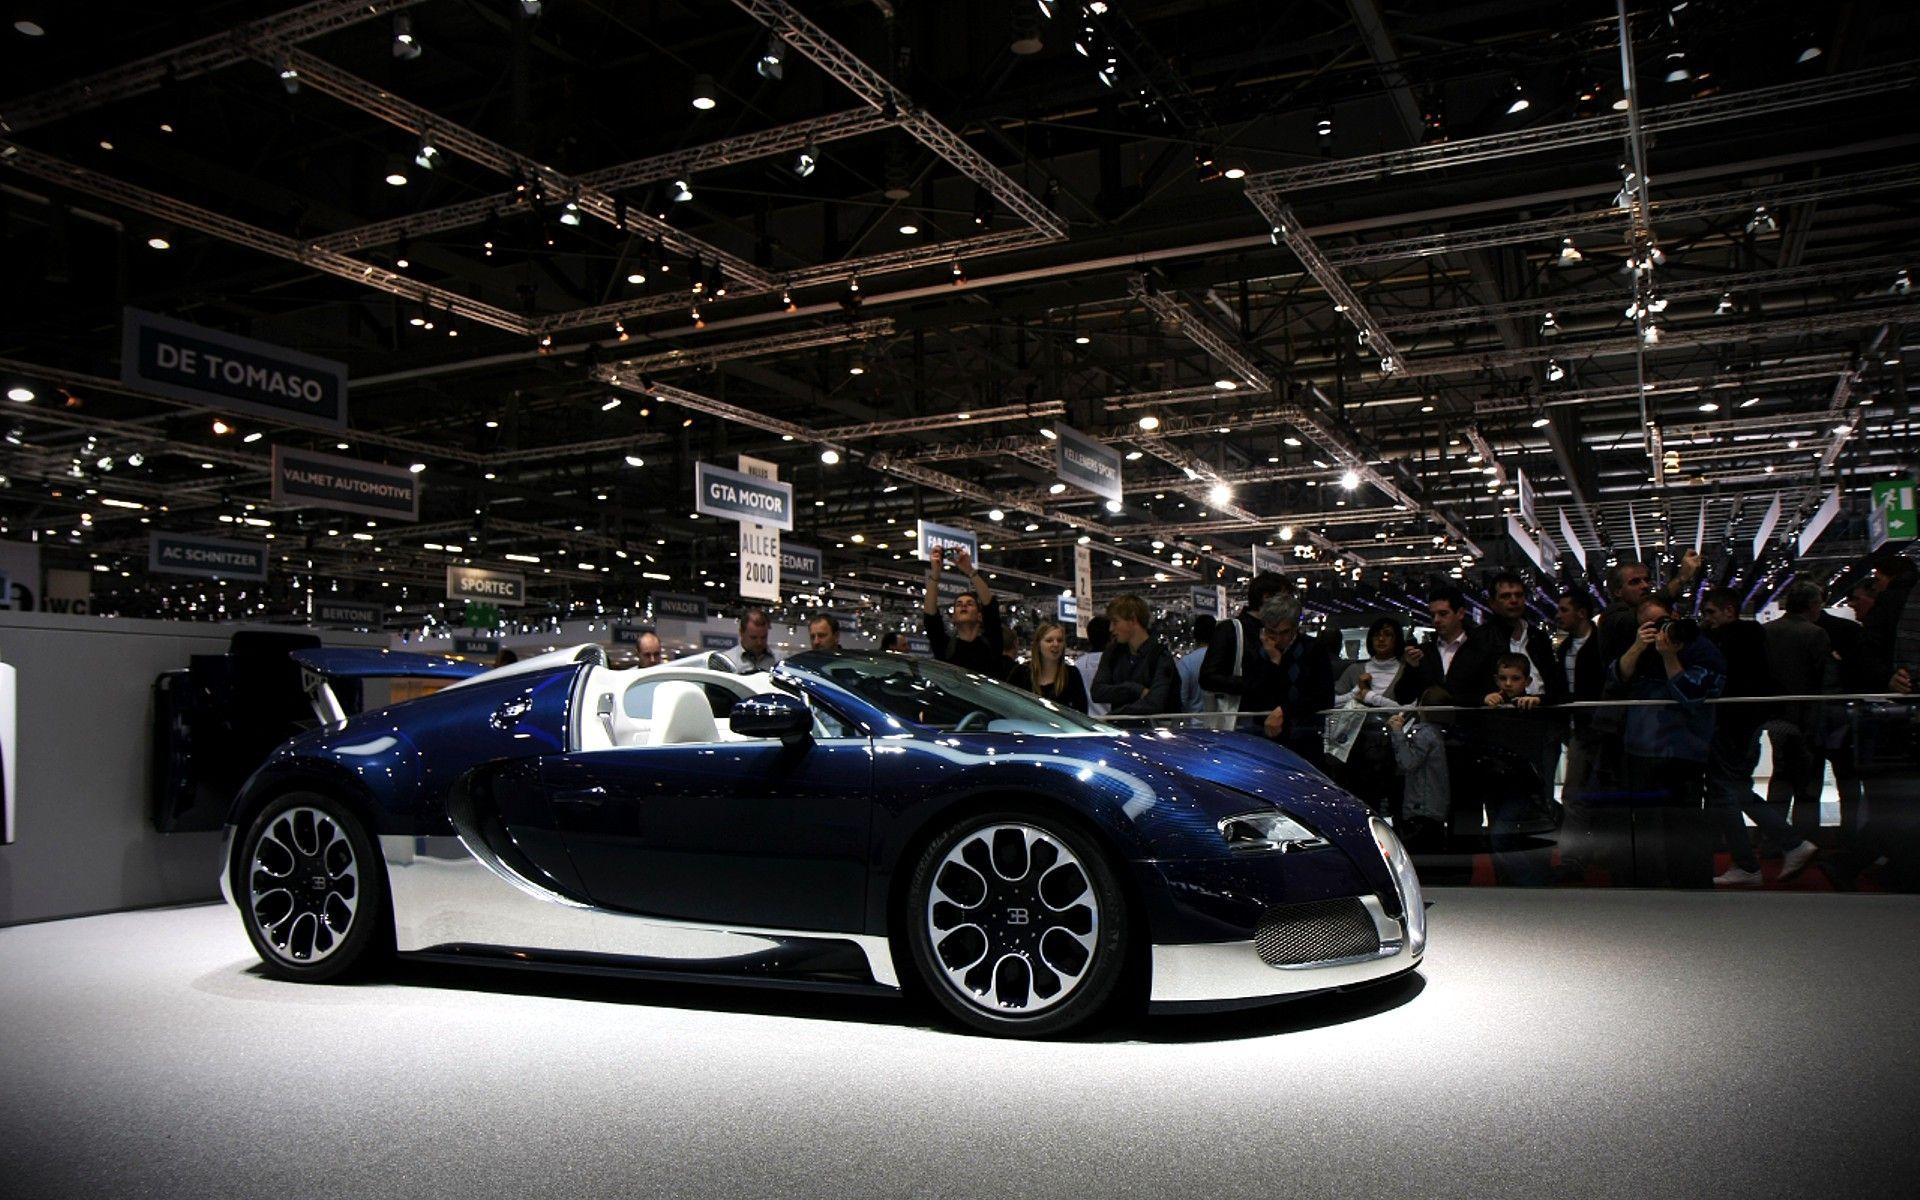 f4d7c19fd710fd0917635dc1947f68f8 Remarkable Bugatti Veyron Grand Sport Vitesse Informacion Cars Trend